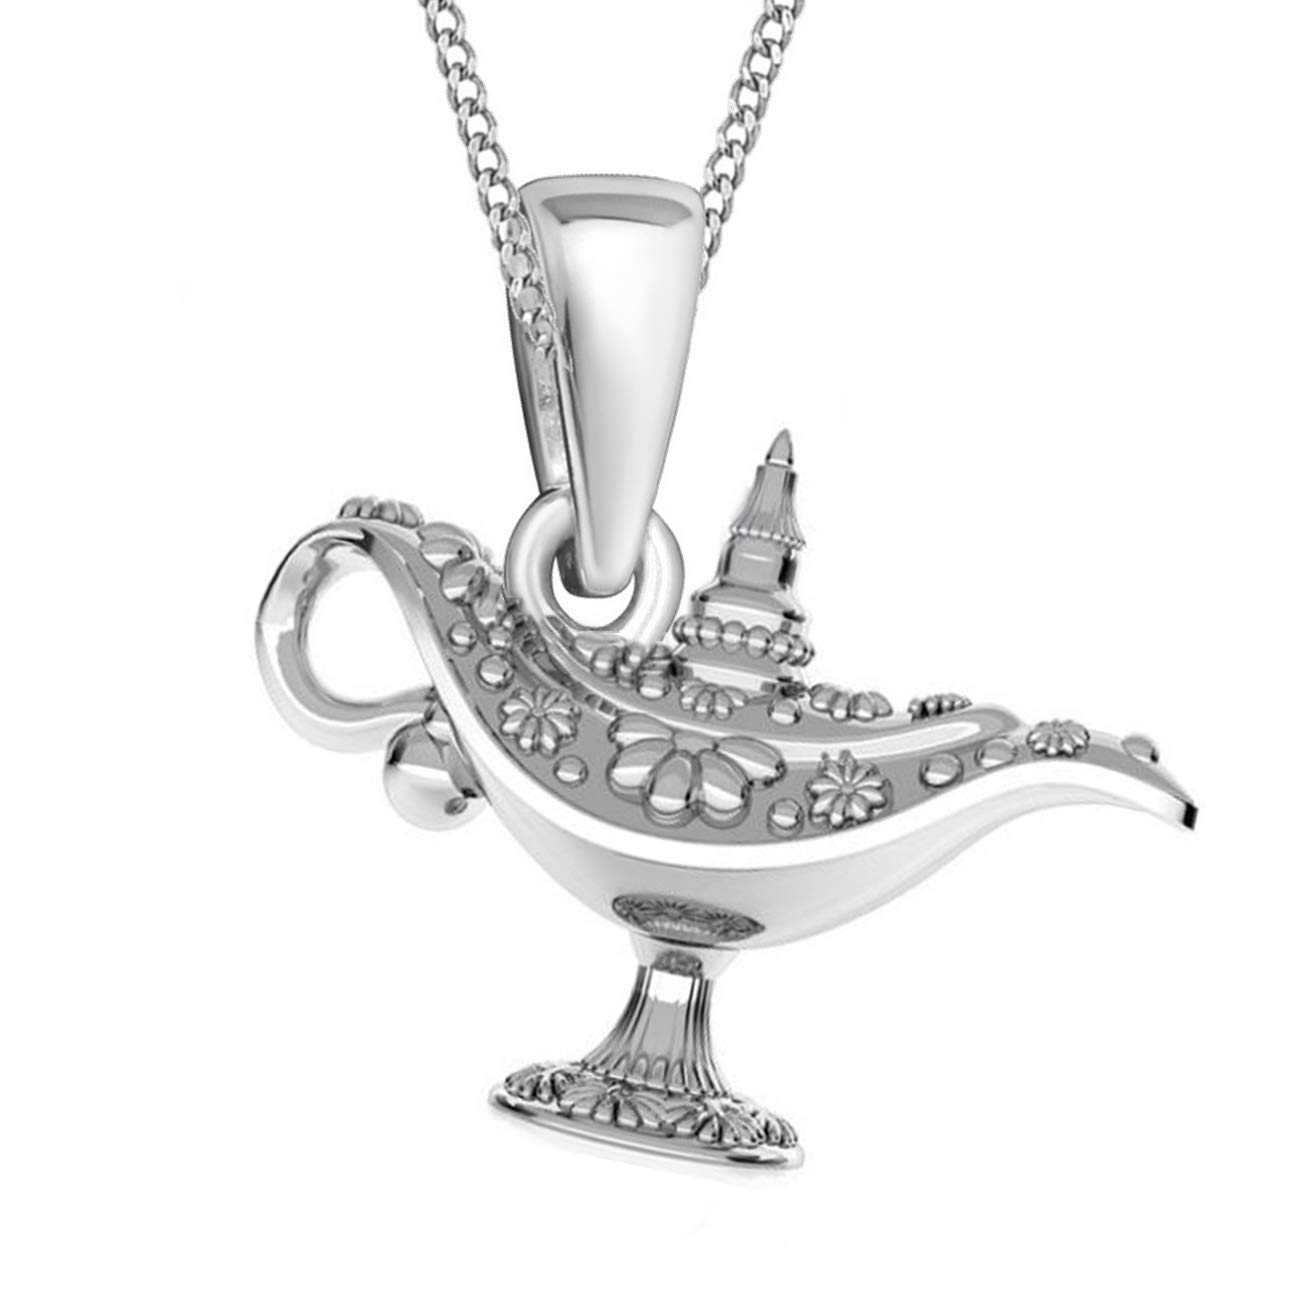 Aladdin Wunderlampe Anh/änger mit Halskette aus 925er Echt Sterling-Silber